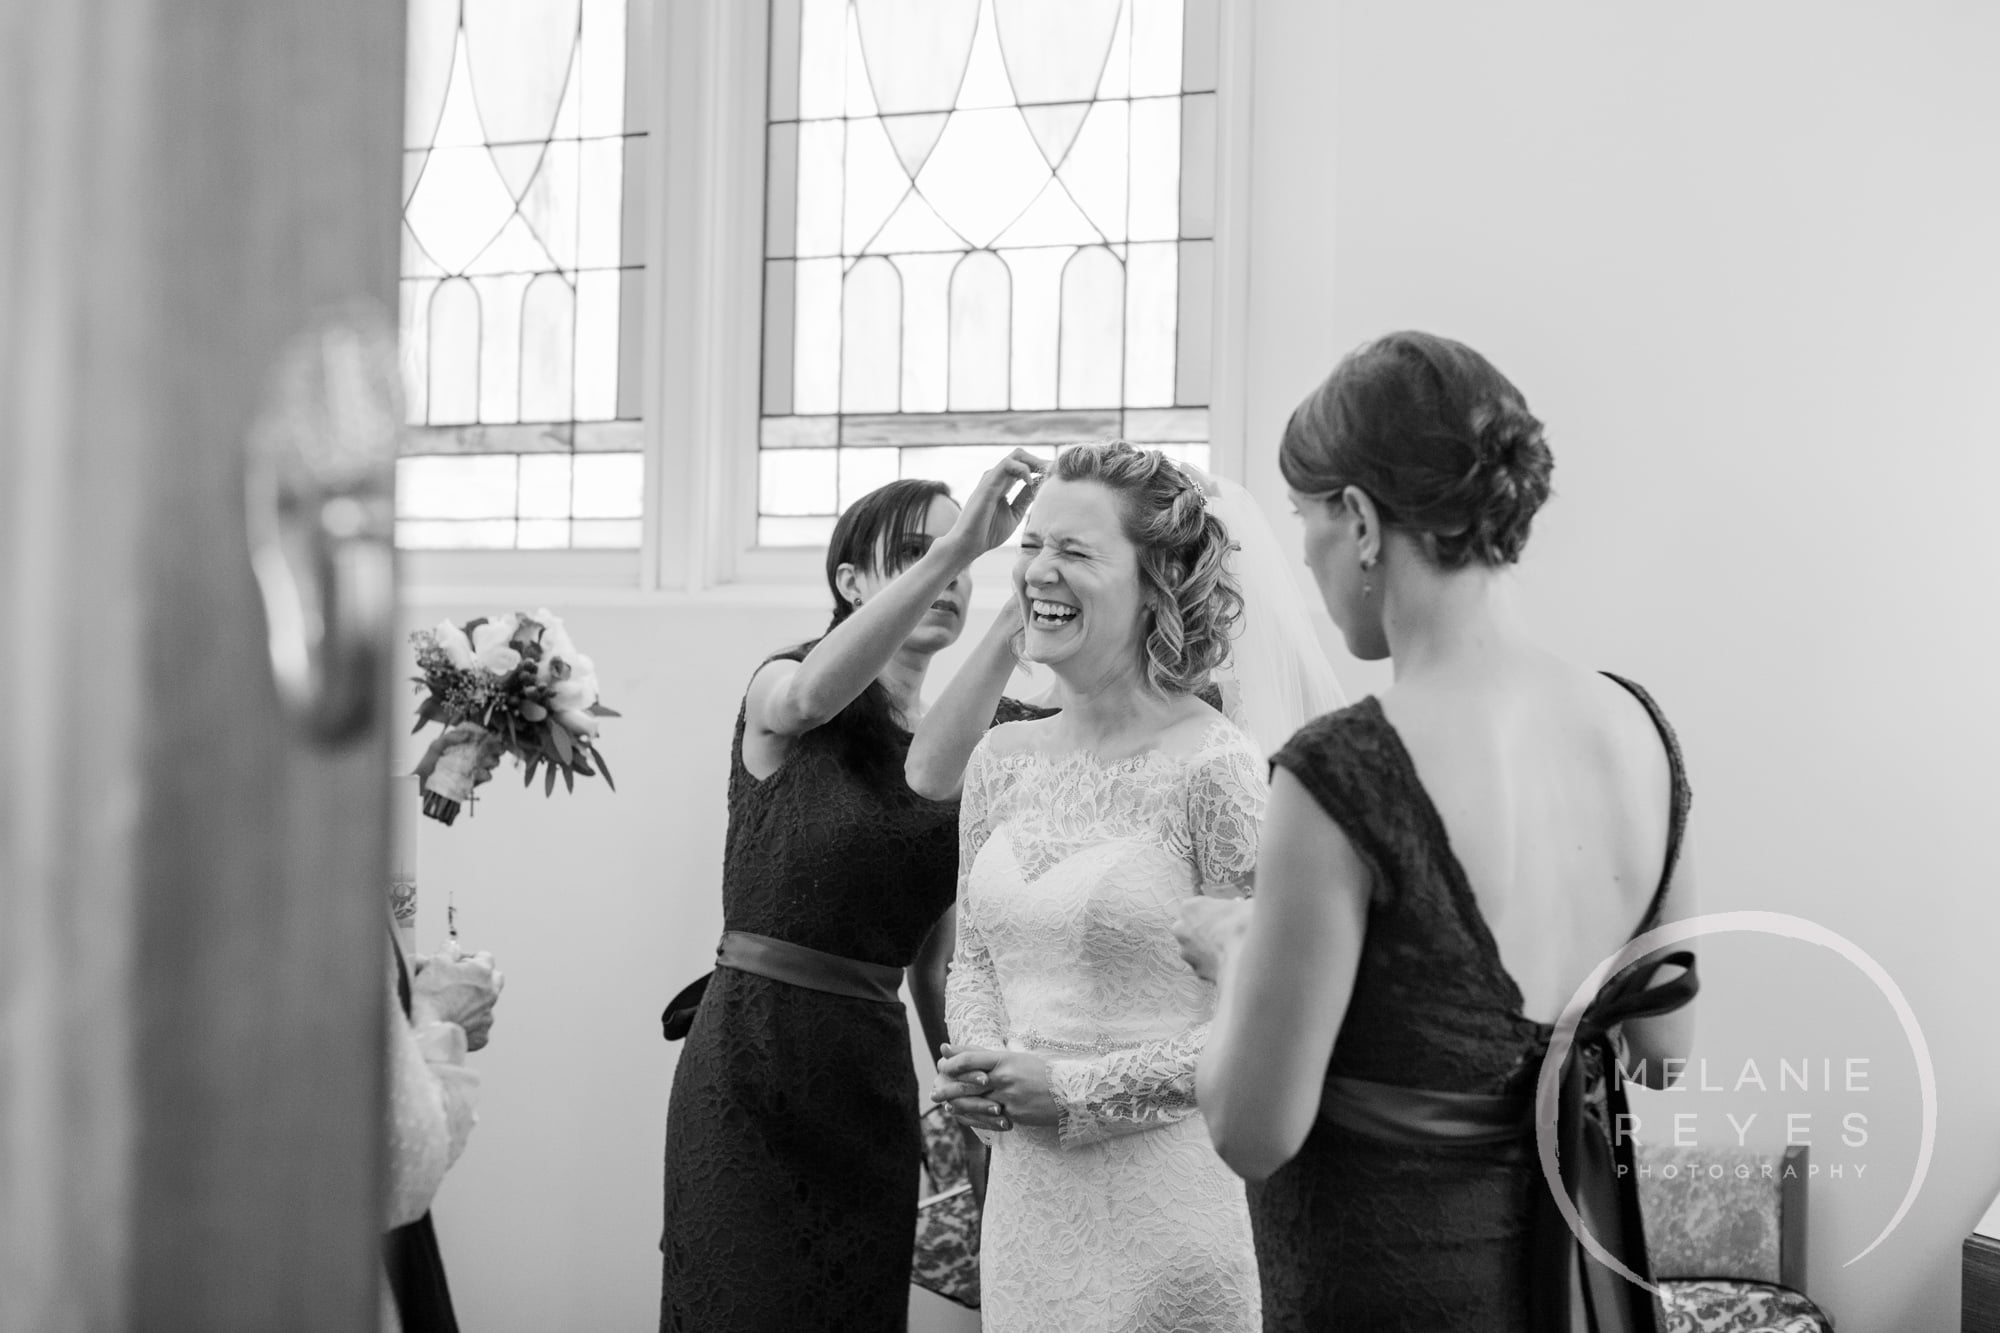 2015_ann_arbor_wedding_photographer_melaniereyes_018.JPG